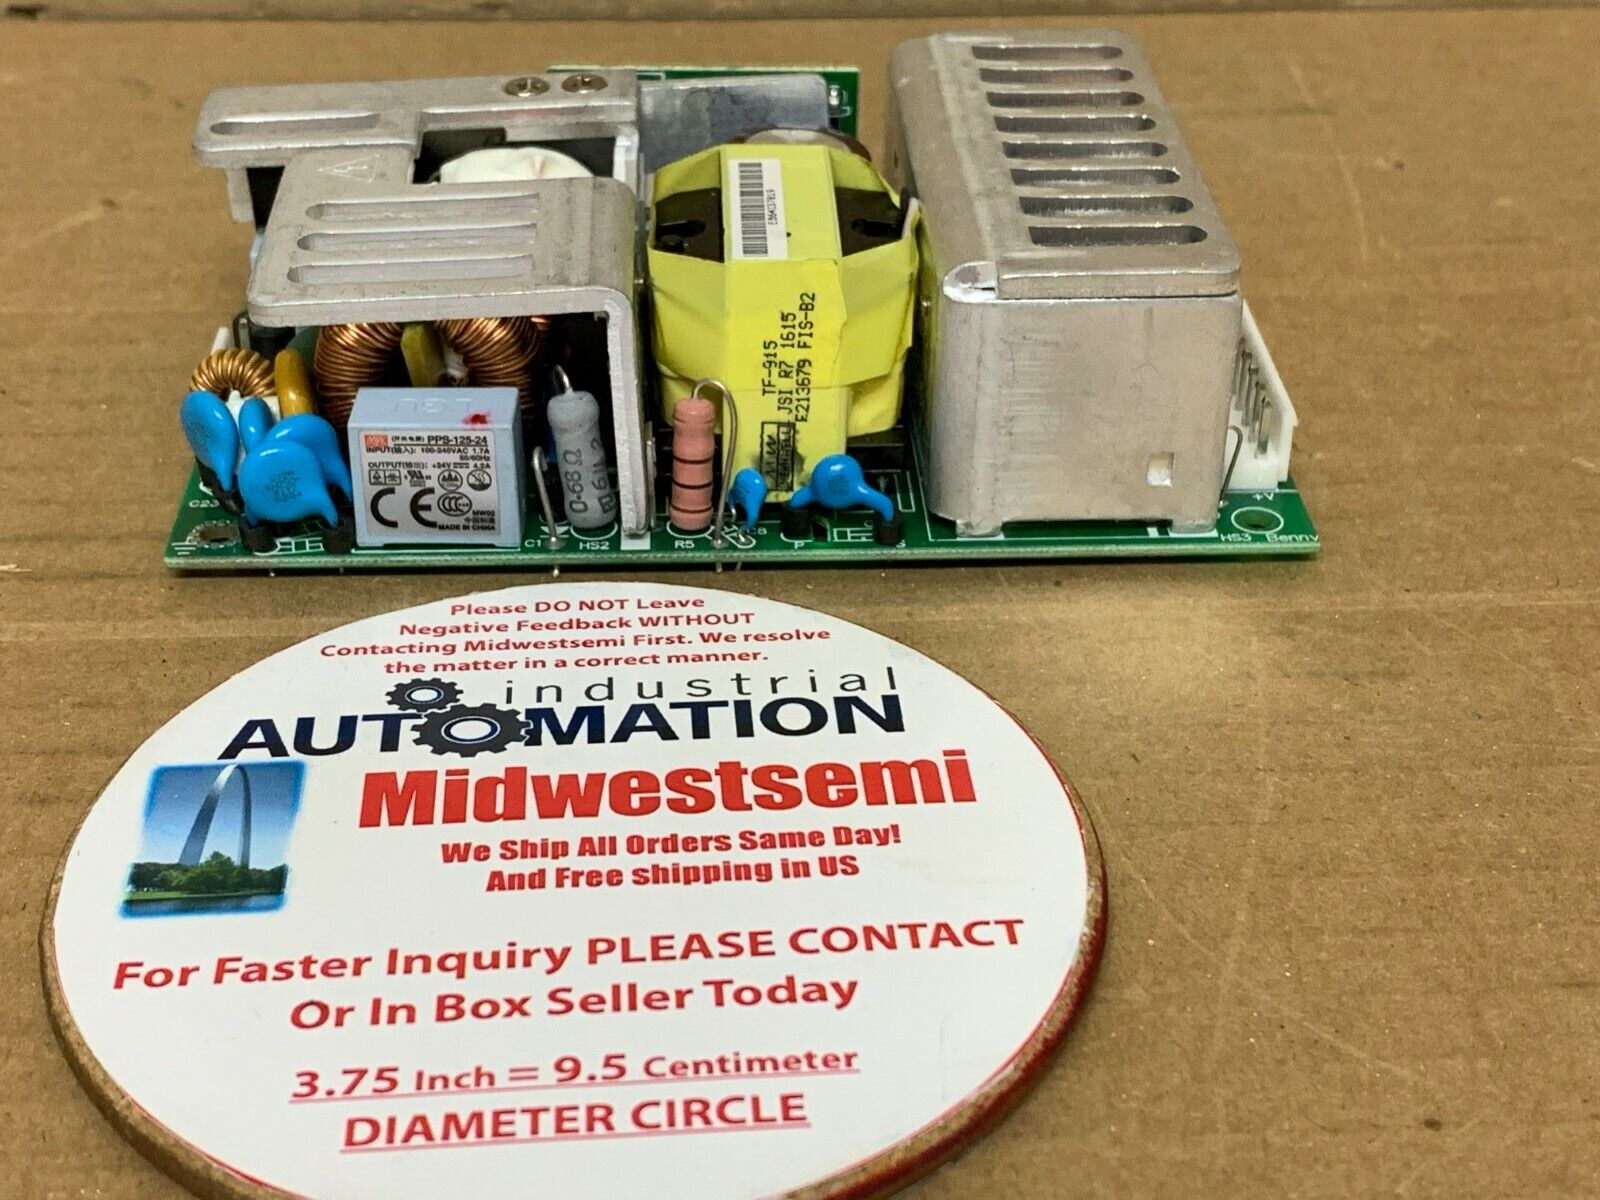 NEW E3017915 MEANWELL  PPS-125-24 POWER SUPPLY 24V 4.2A OPEN FRAME SHIPSAMEDAY